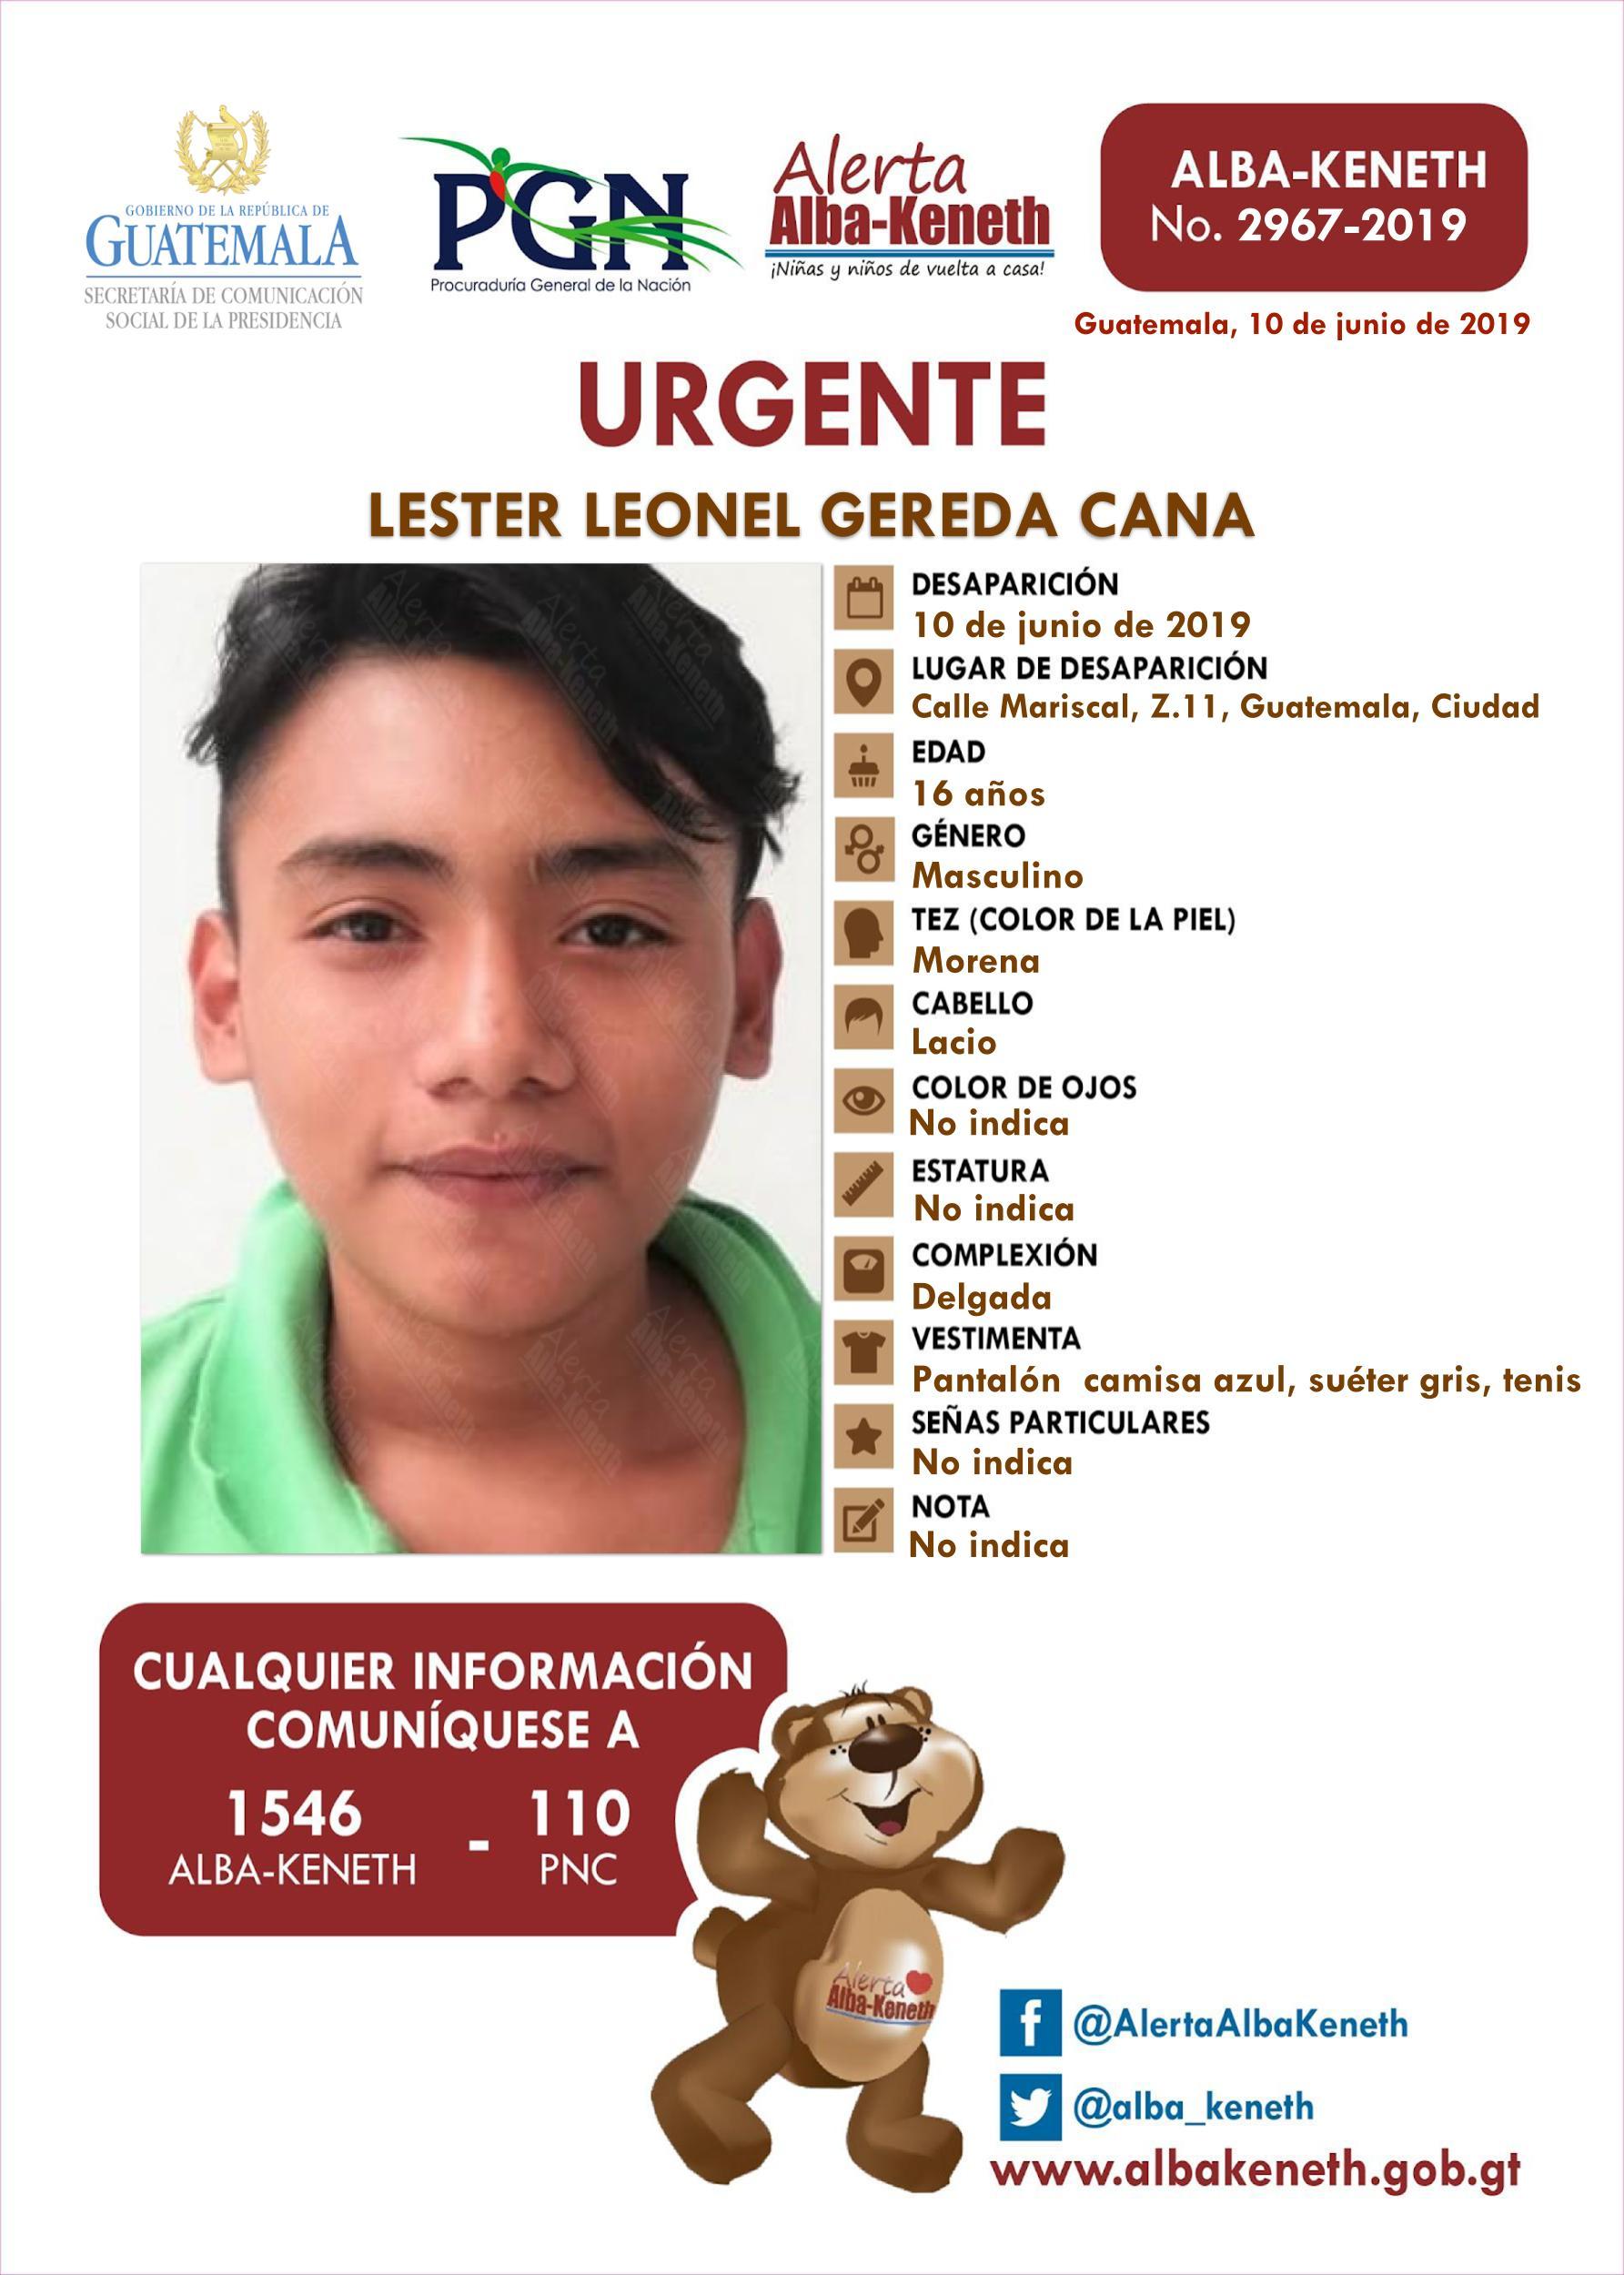 Lester Leonel Gereda Cana